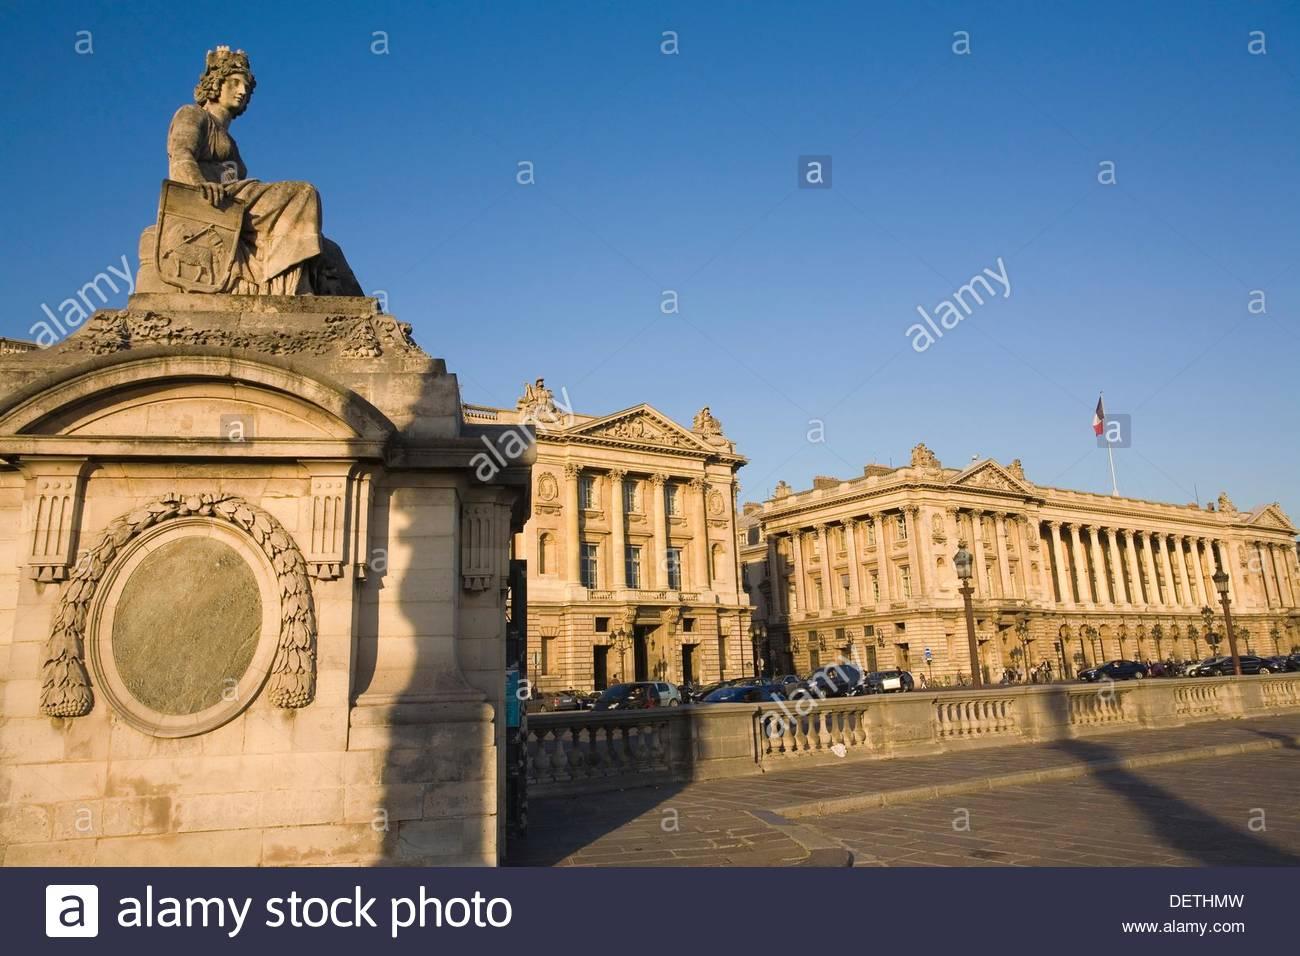 On background Hotel de Crillon in Place de la Concorde Paris 1300x956